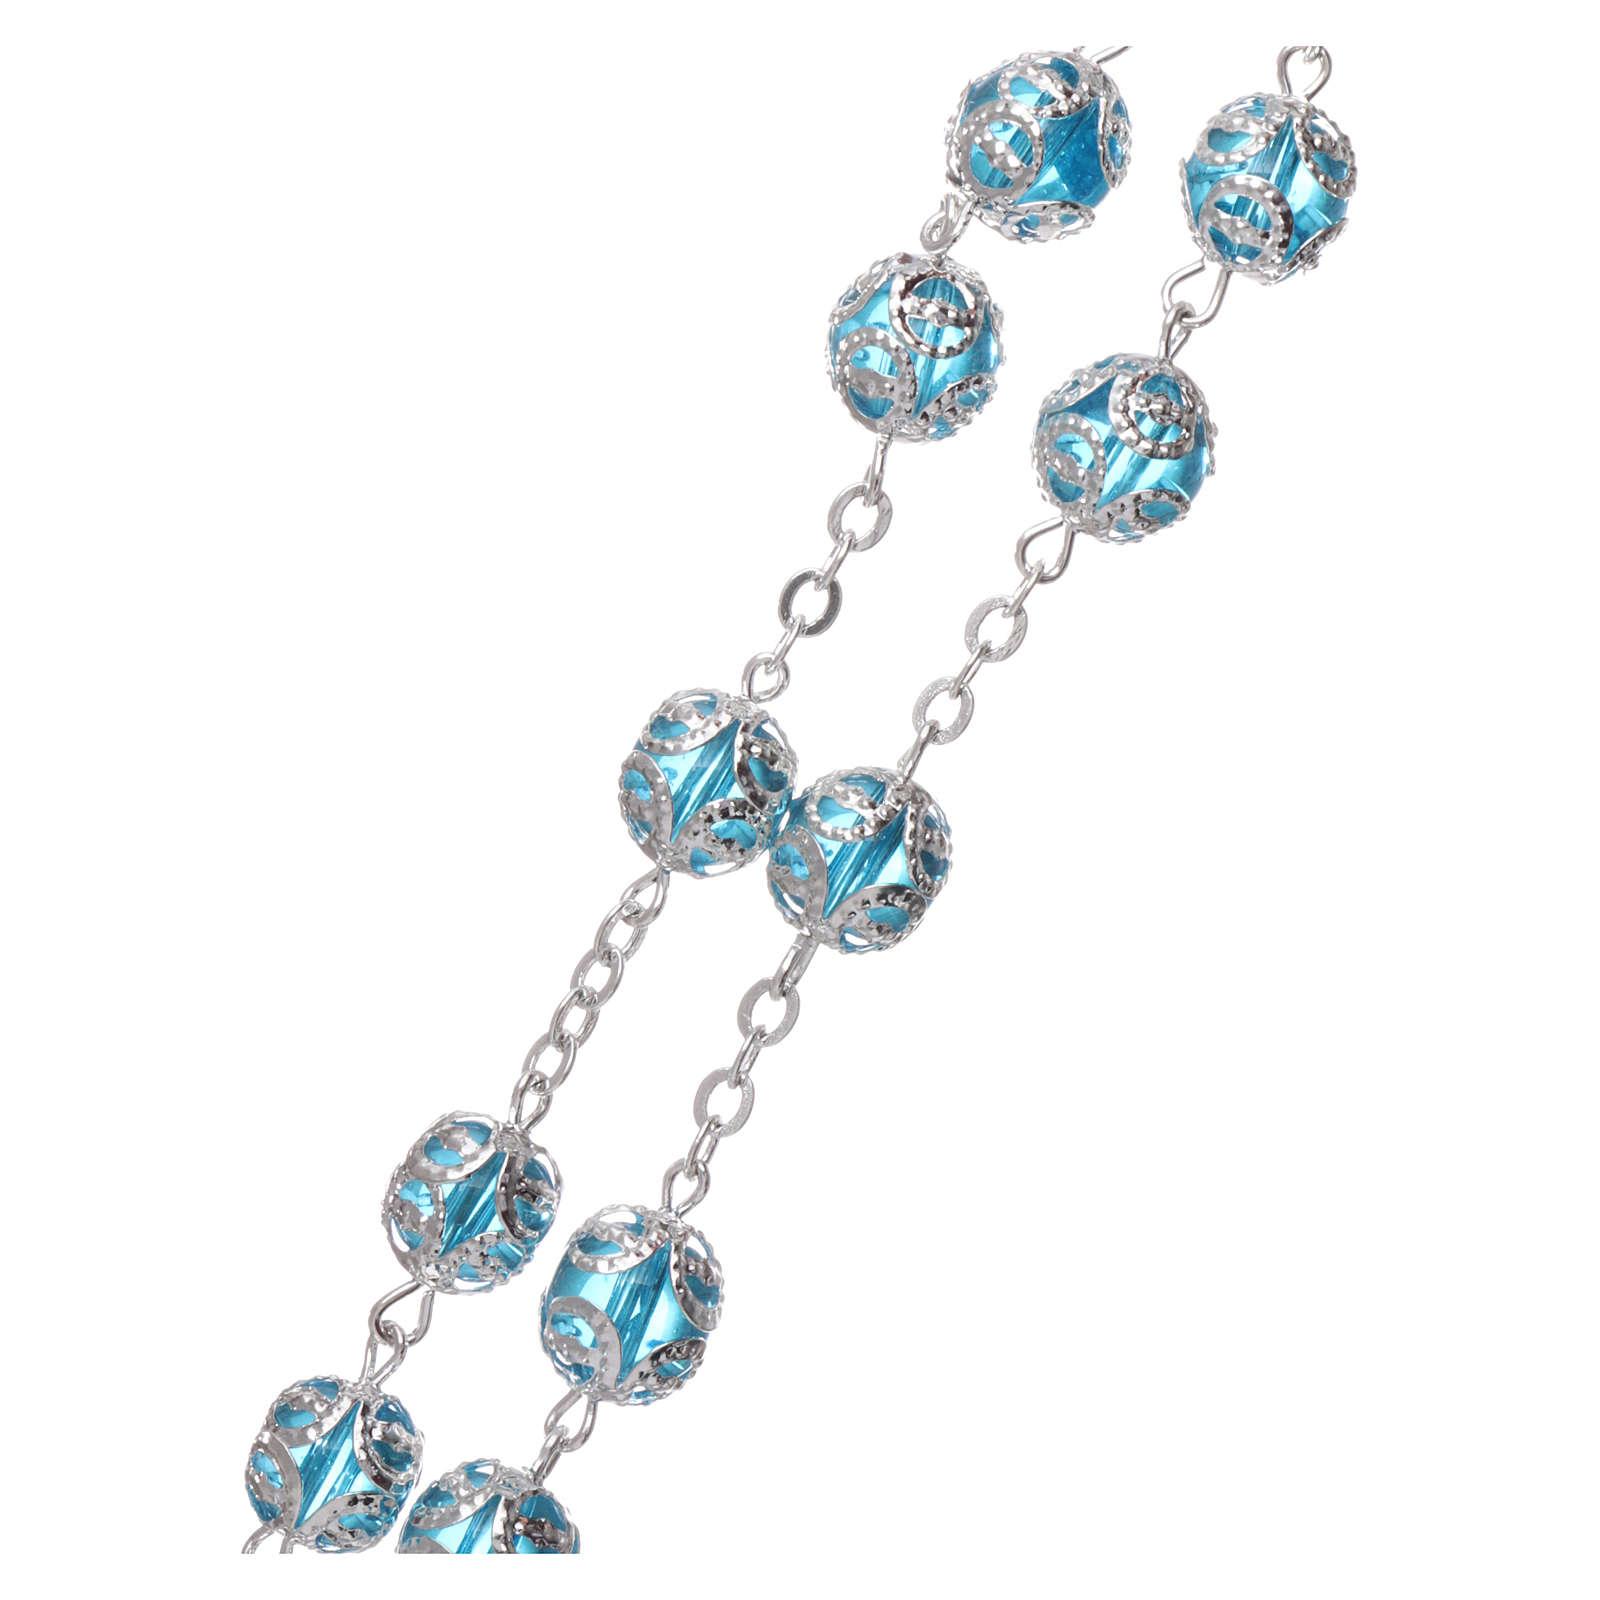 Glass rosary with 7x6 mm grains, aqua 4